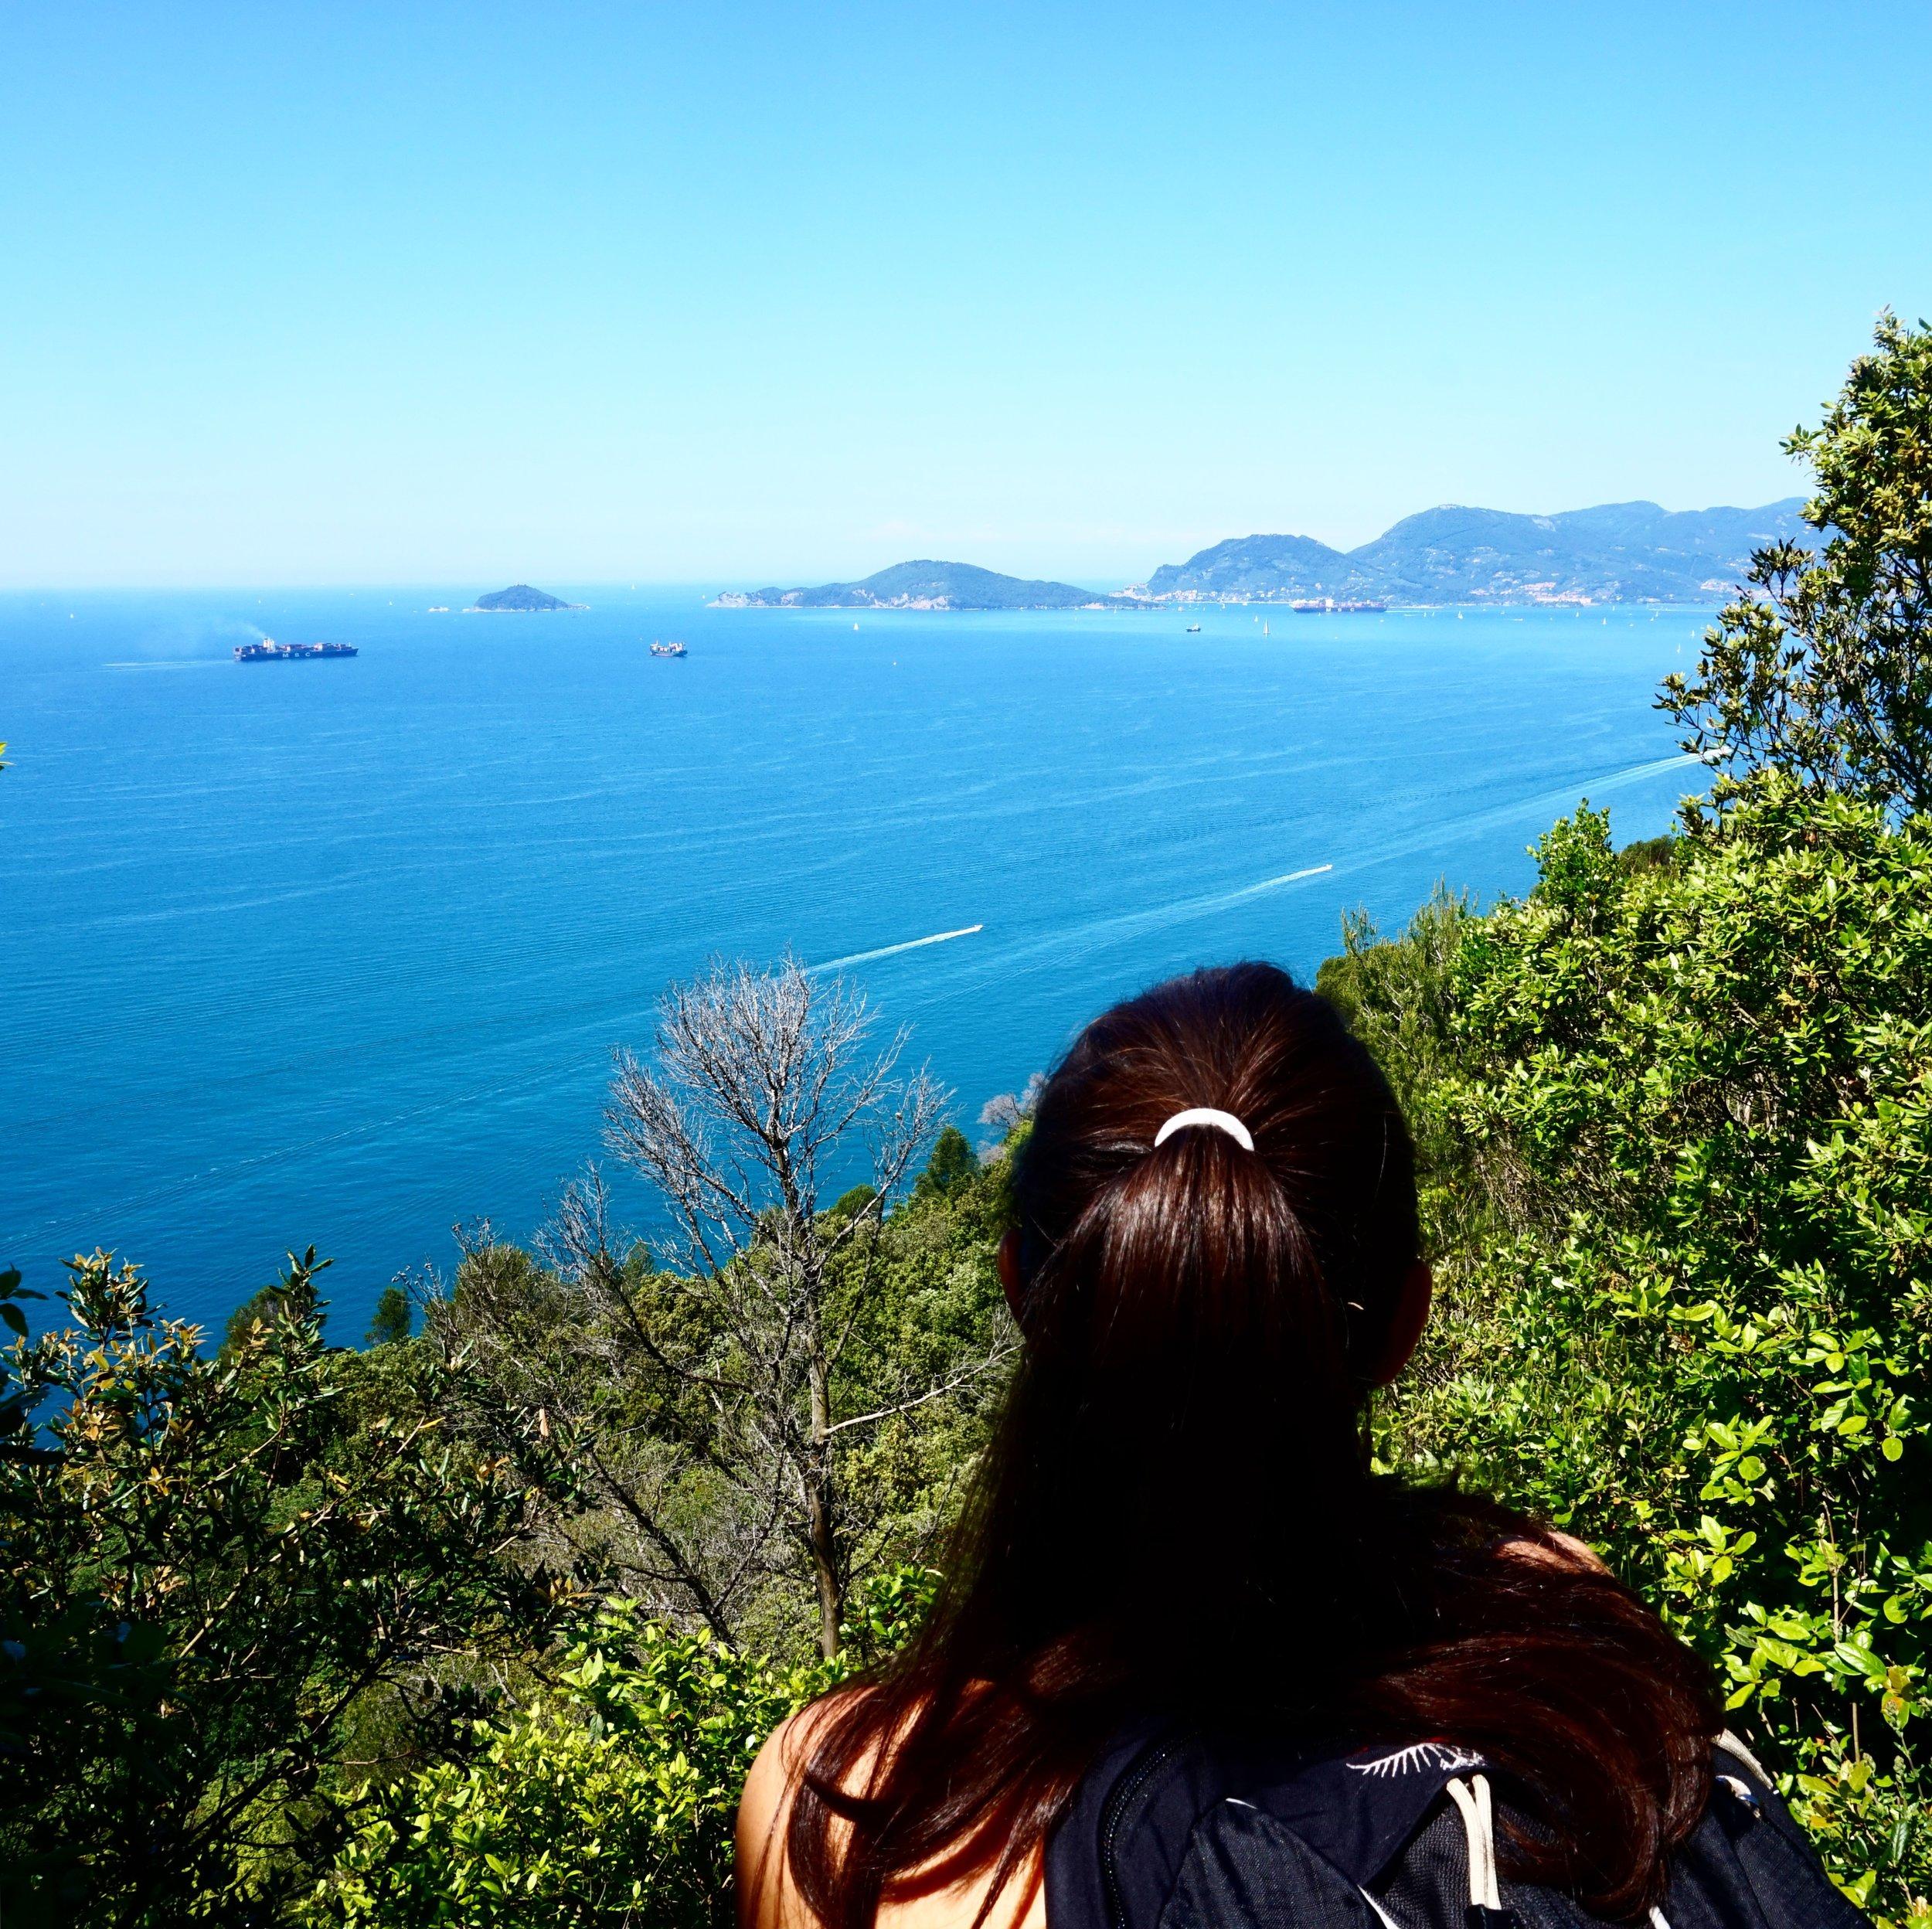 italy tuscany australia cinque terre change love life live joy yoga relationships family running fitness